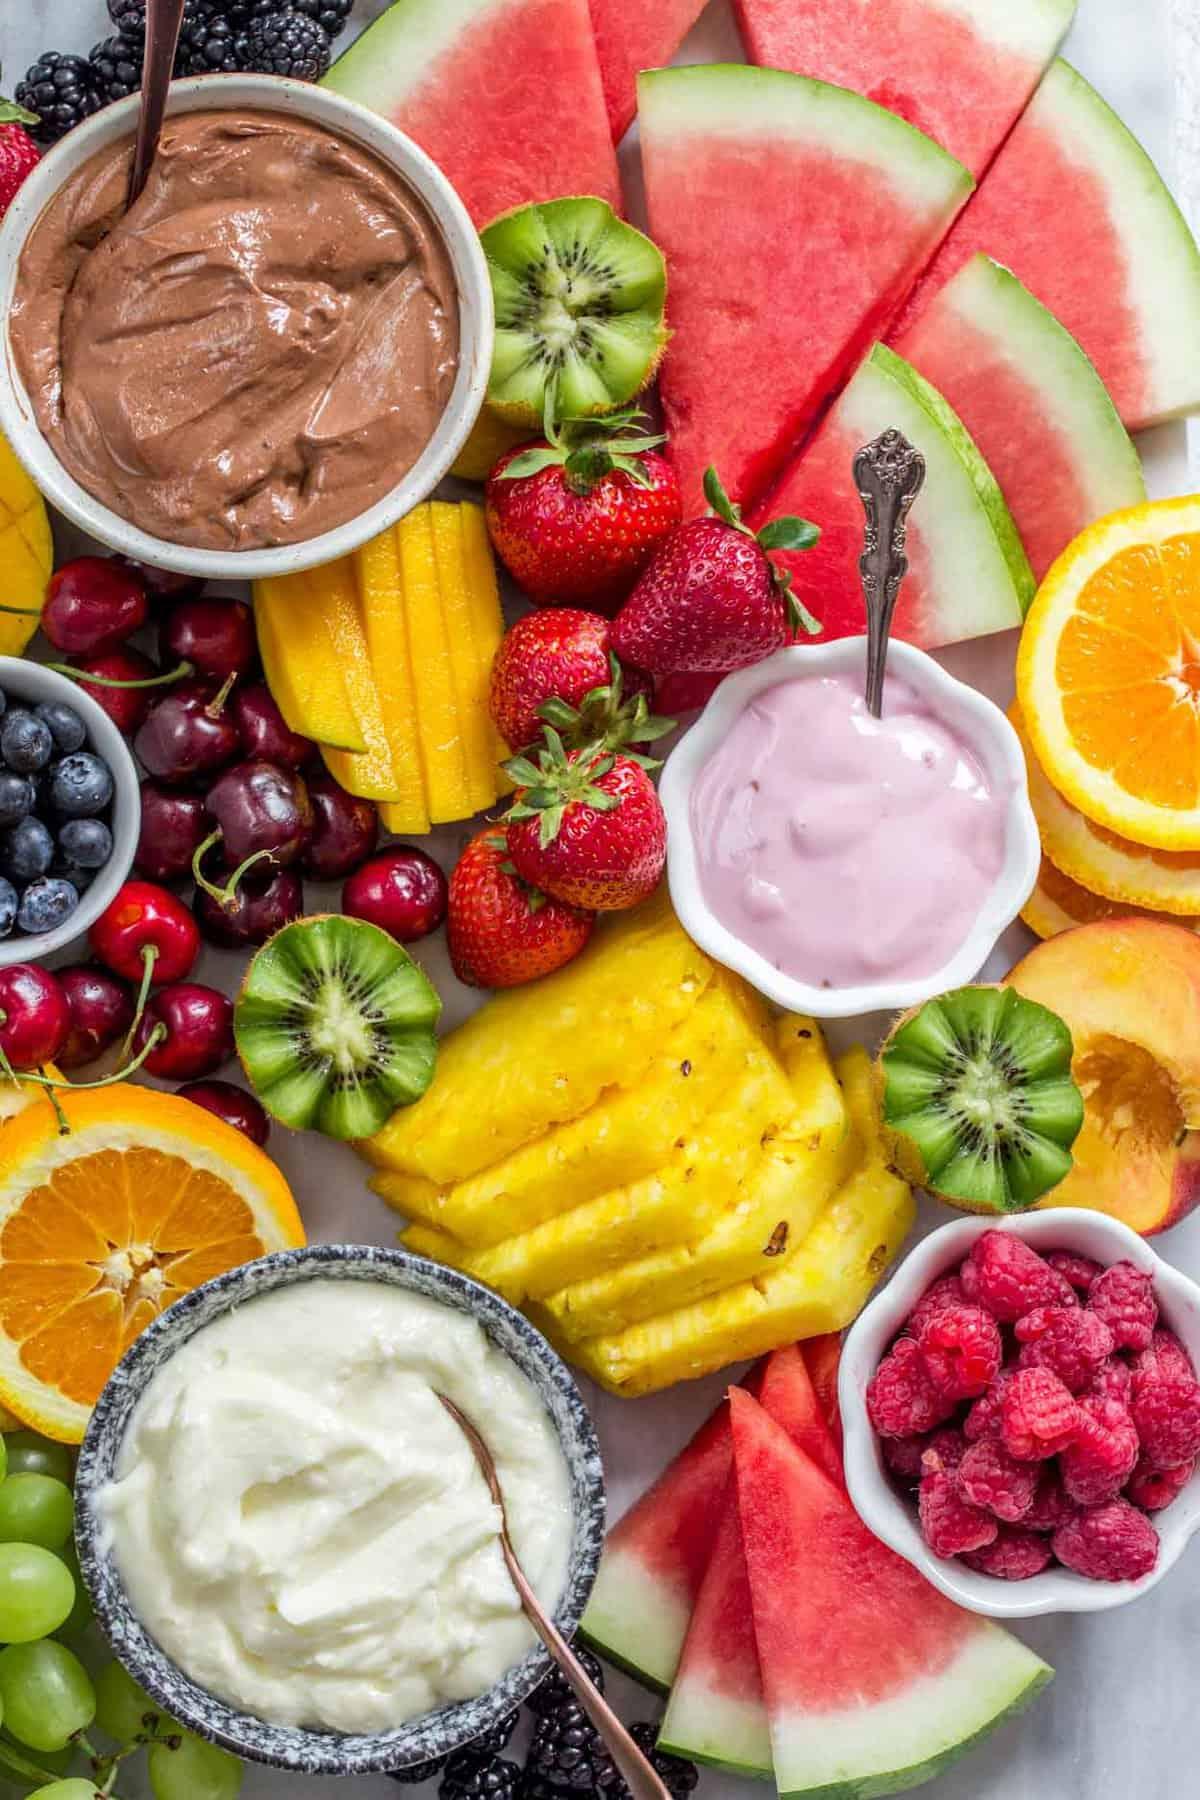 How To Make The Ultimate Fruit Platter Valentina S Corner